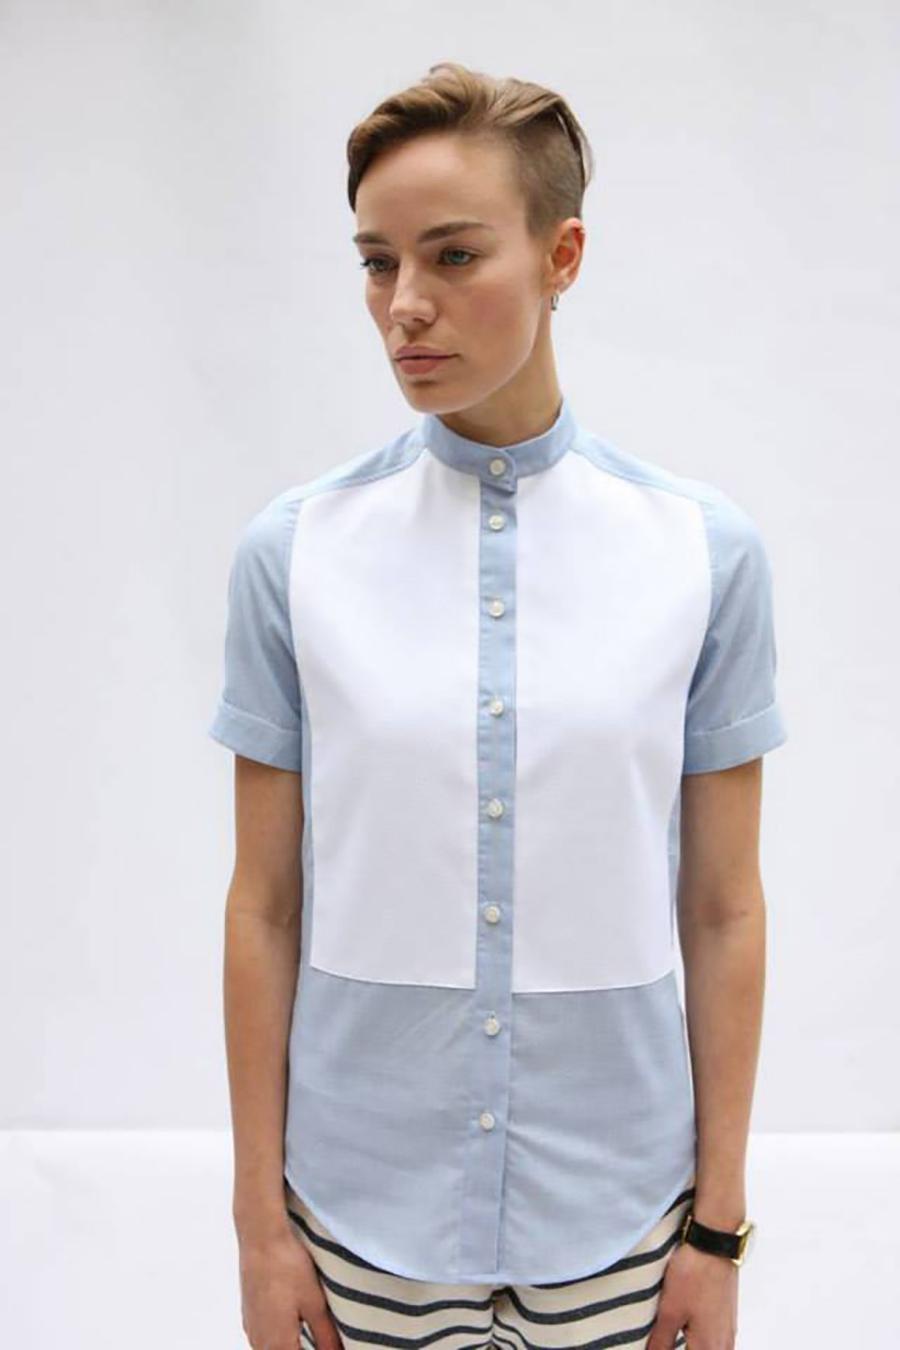 blue & white dress shirt.jpg